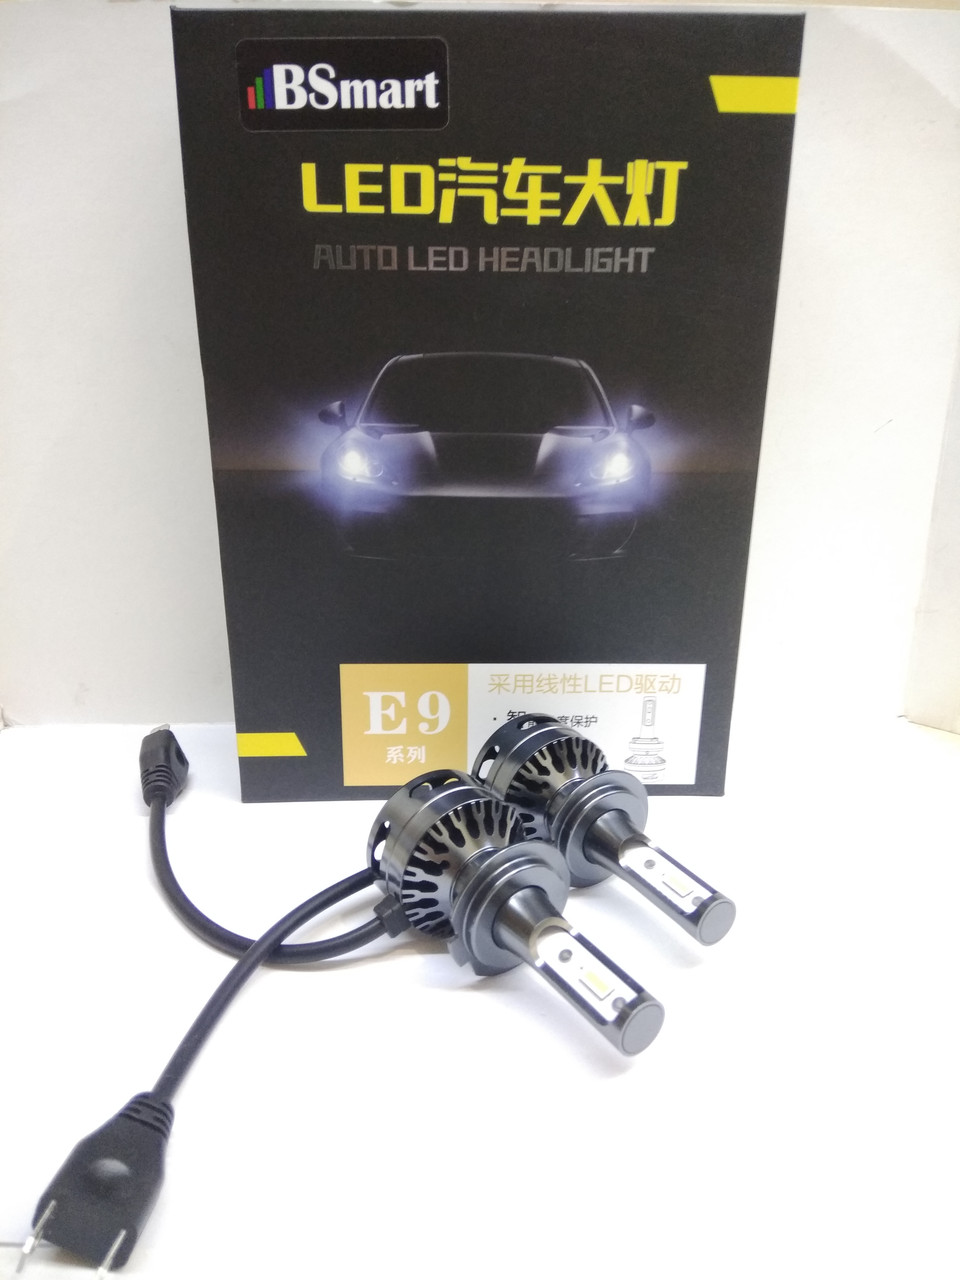 Aвтолампы LED E9, H7, 6000K, 10000Lm, 80W, CANBUS